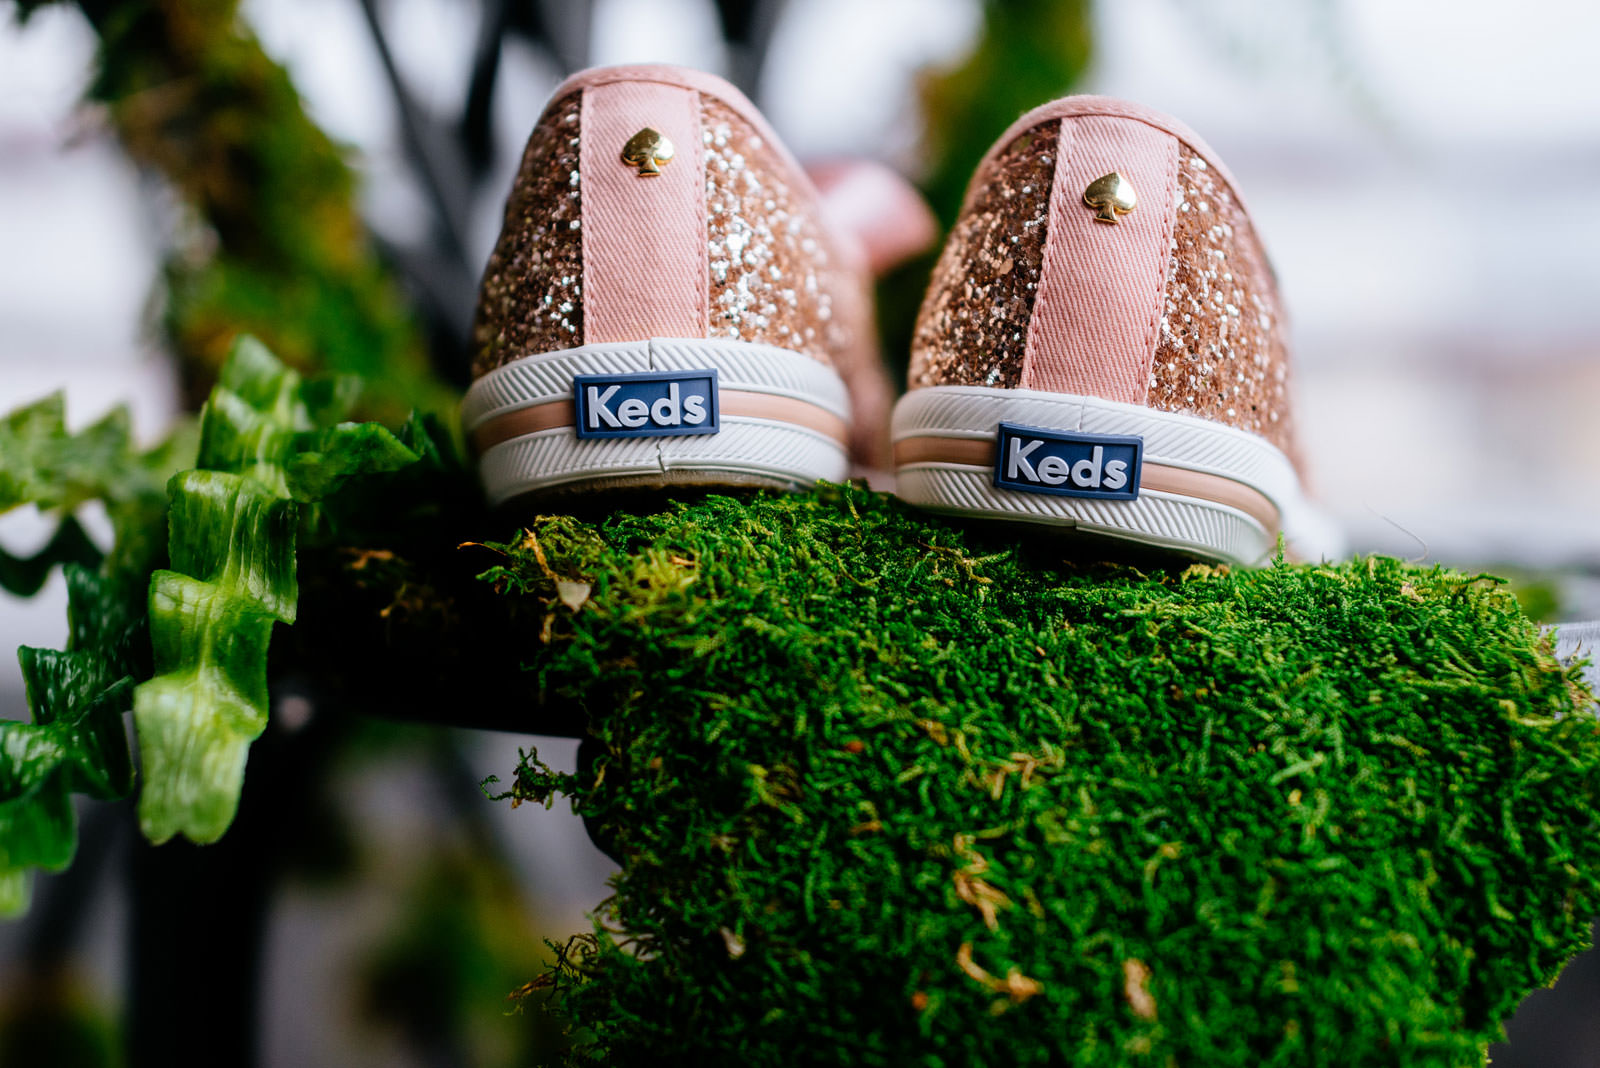 wedding details kate spade glitter keds sneakers